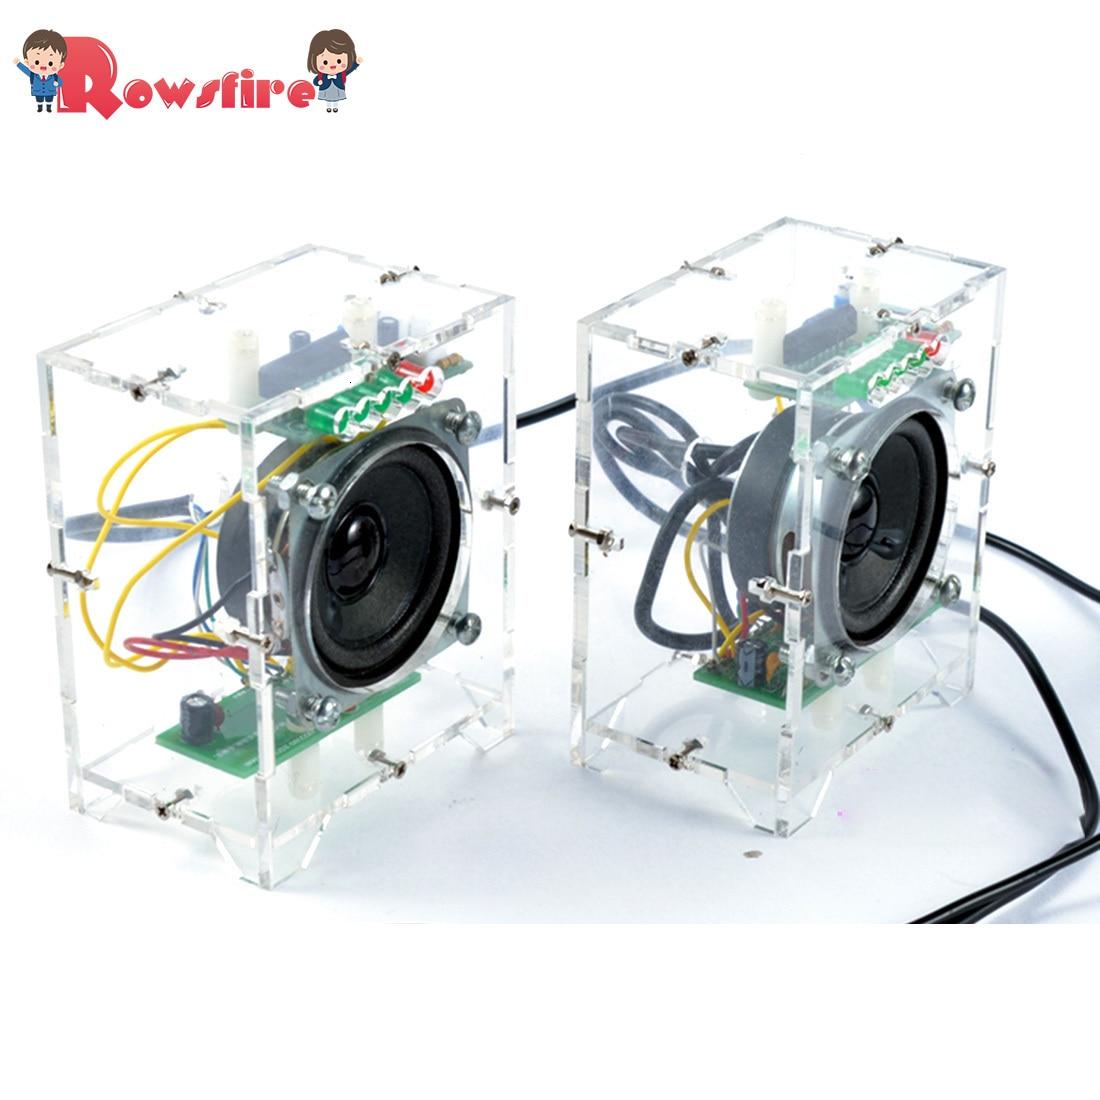 2Pcs DIY Mini Speaker Kit MP3 Small Speaker Sound Amplifier With LED Music Spectrum